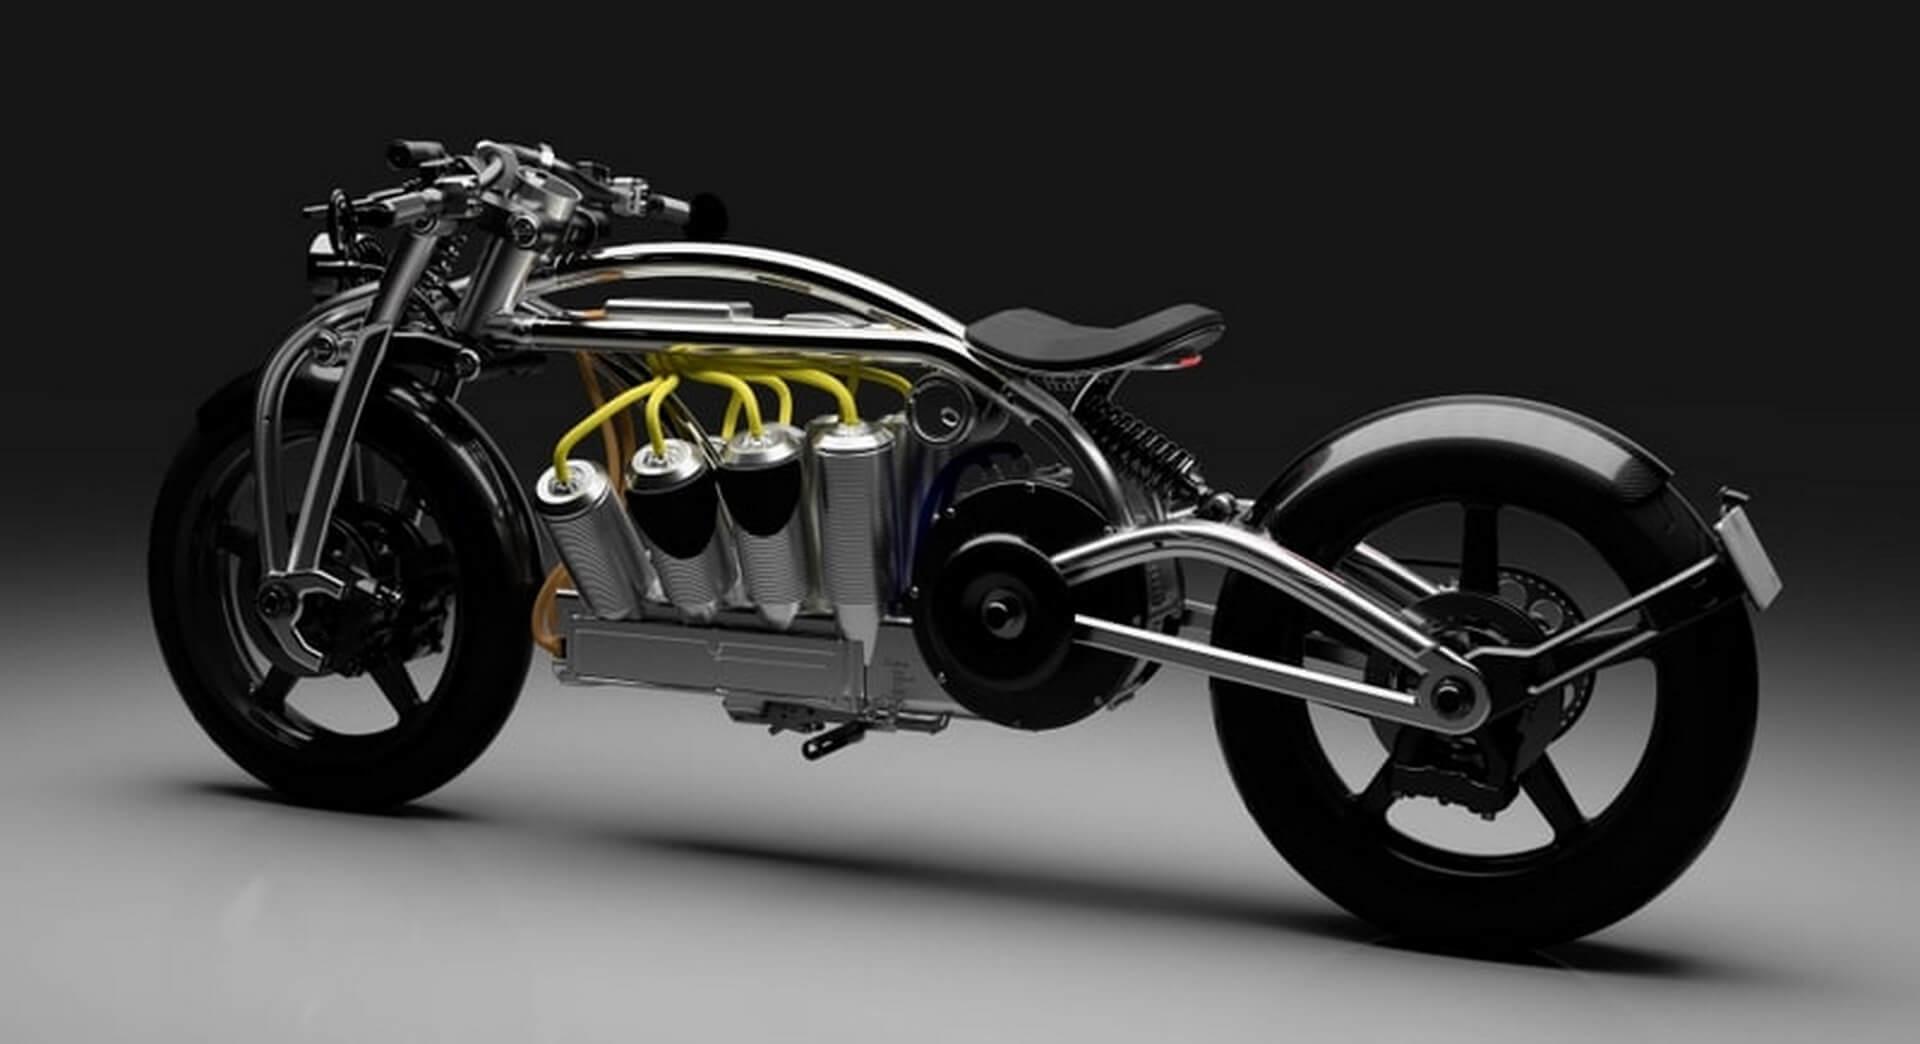 Curtiss Motorcycles представила электрический мотоцикл с аккумуляторами ввиде V8